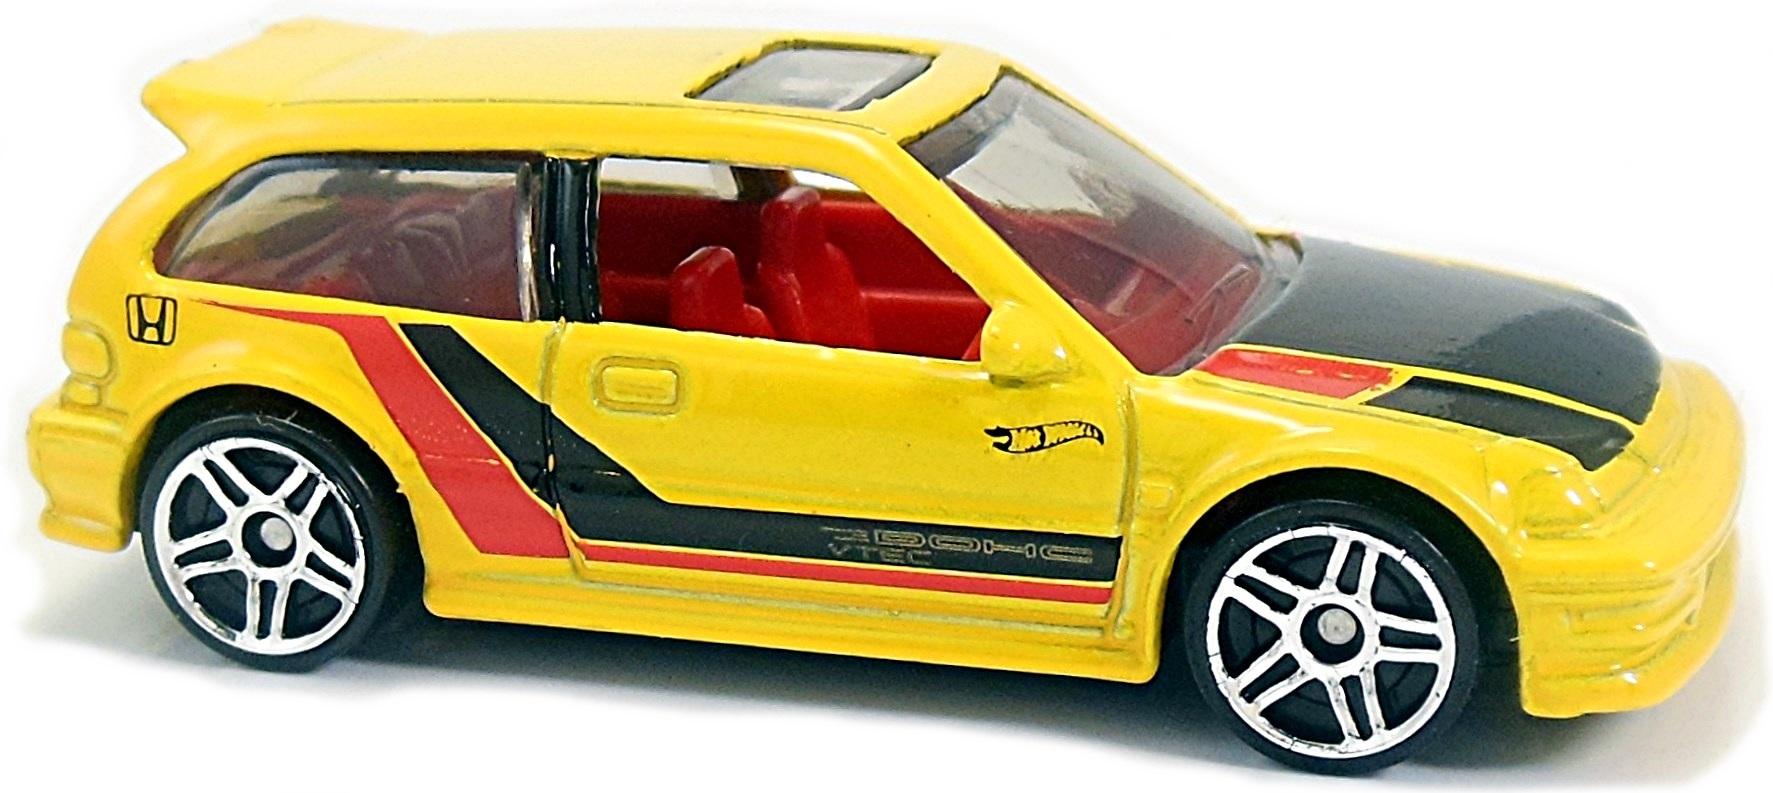 First Look: 2015 Hot Wheels 1990 Honda Civic EF Zamac